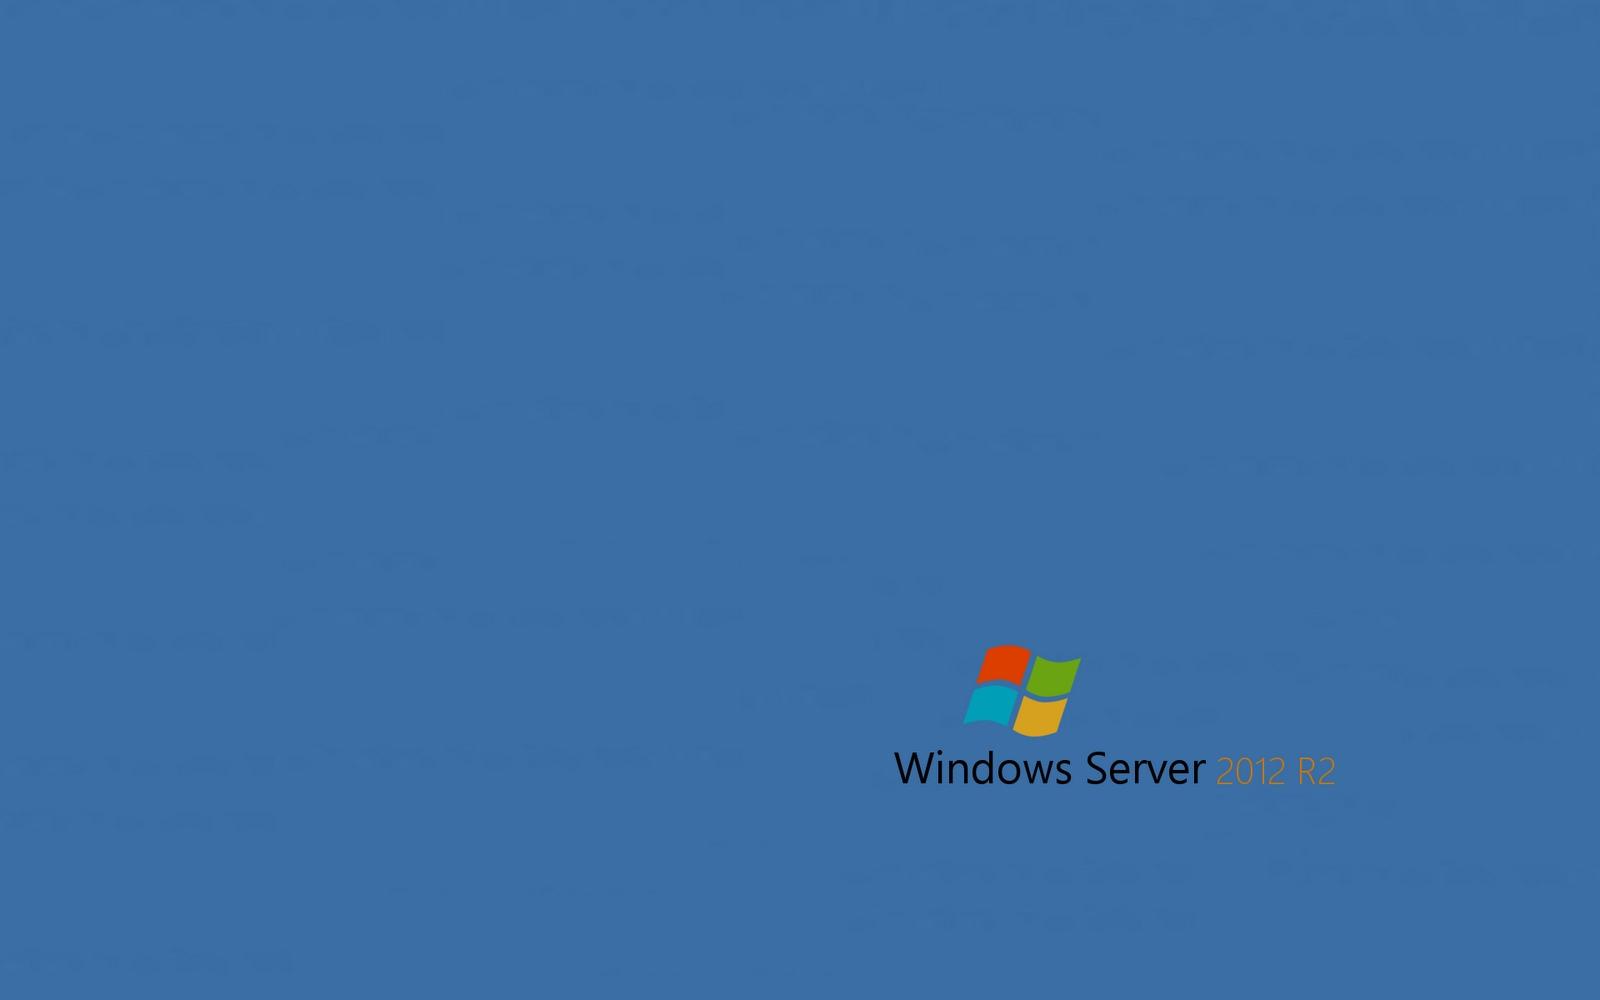 windows server wallpapers - wallpaper cave